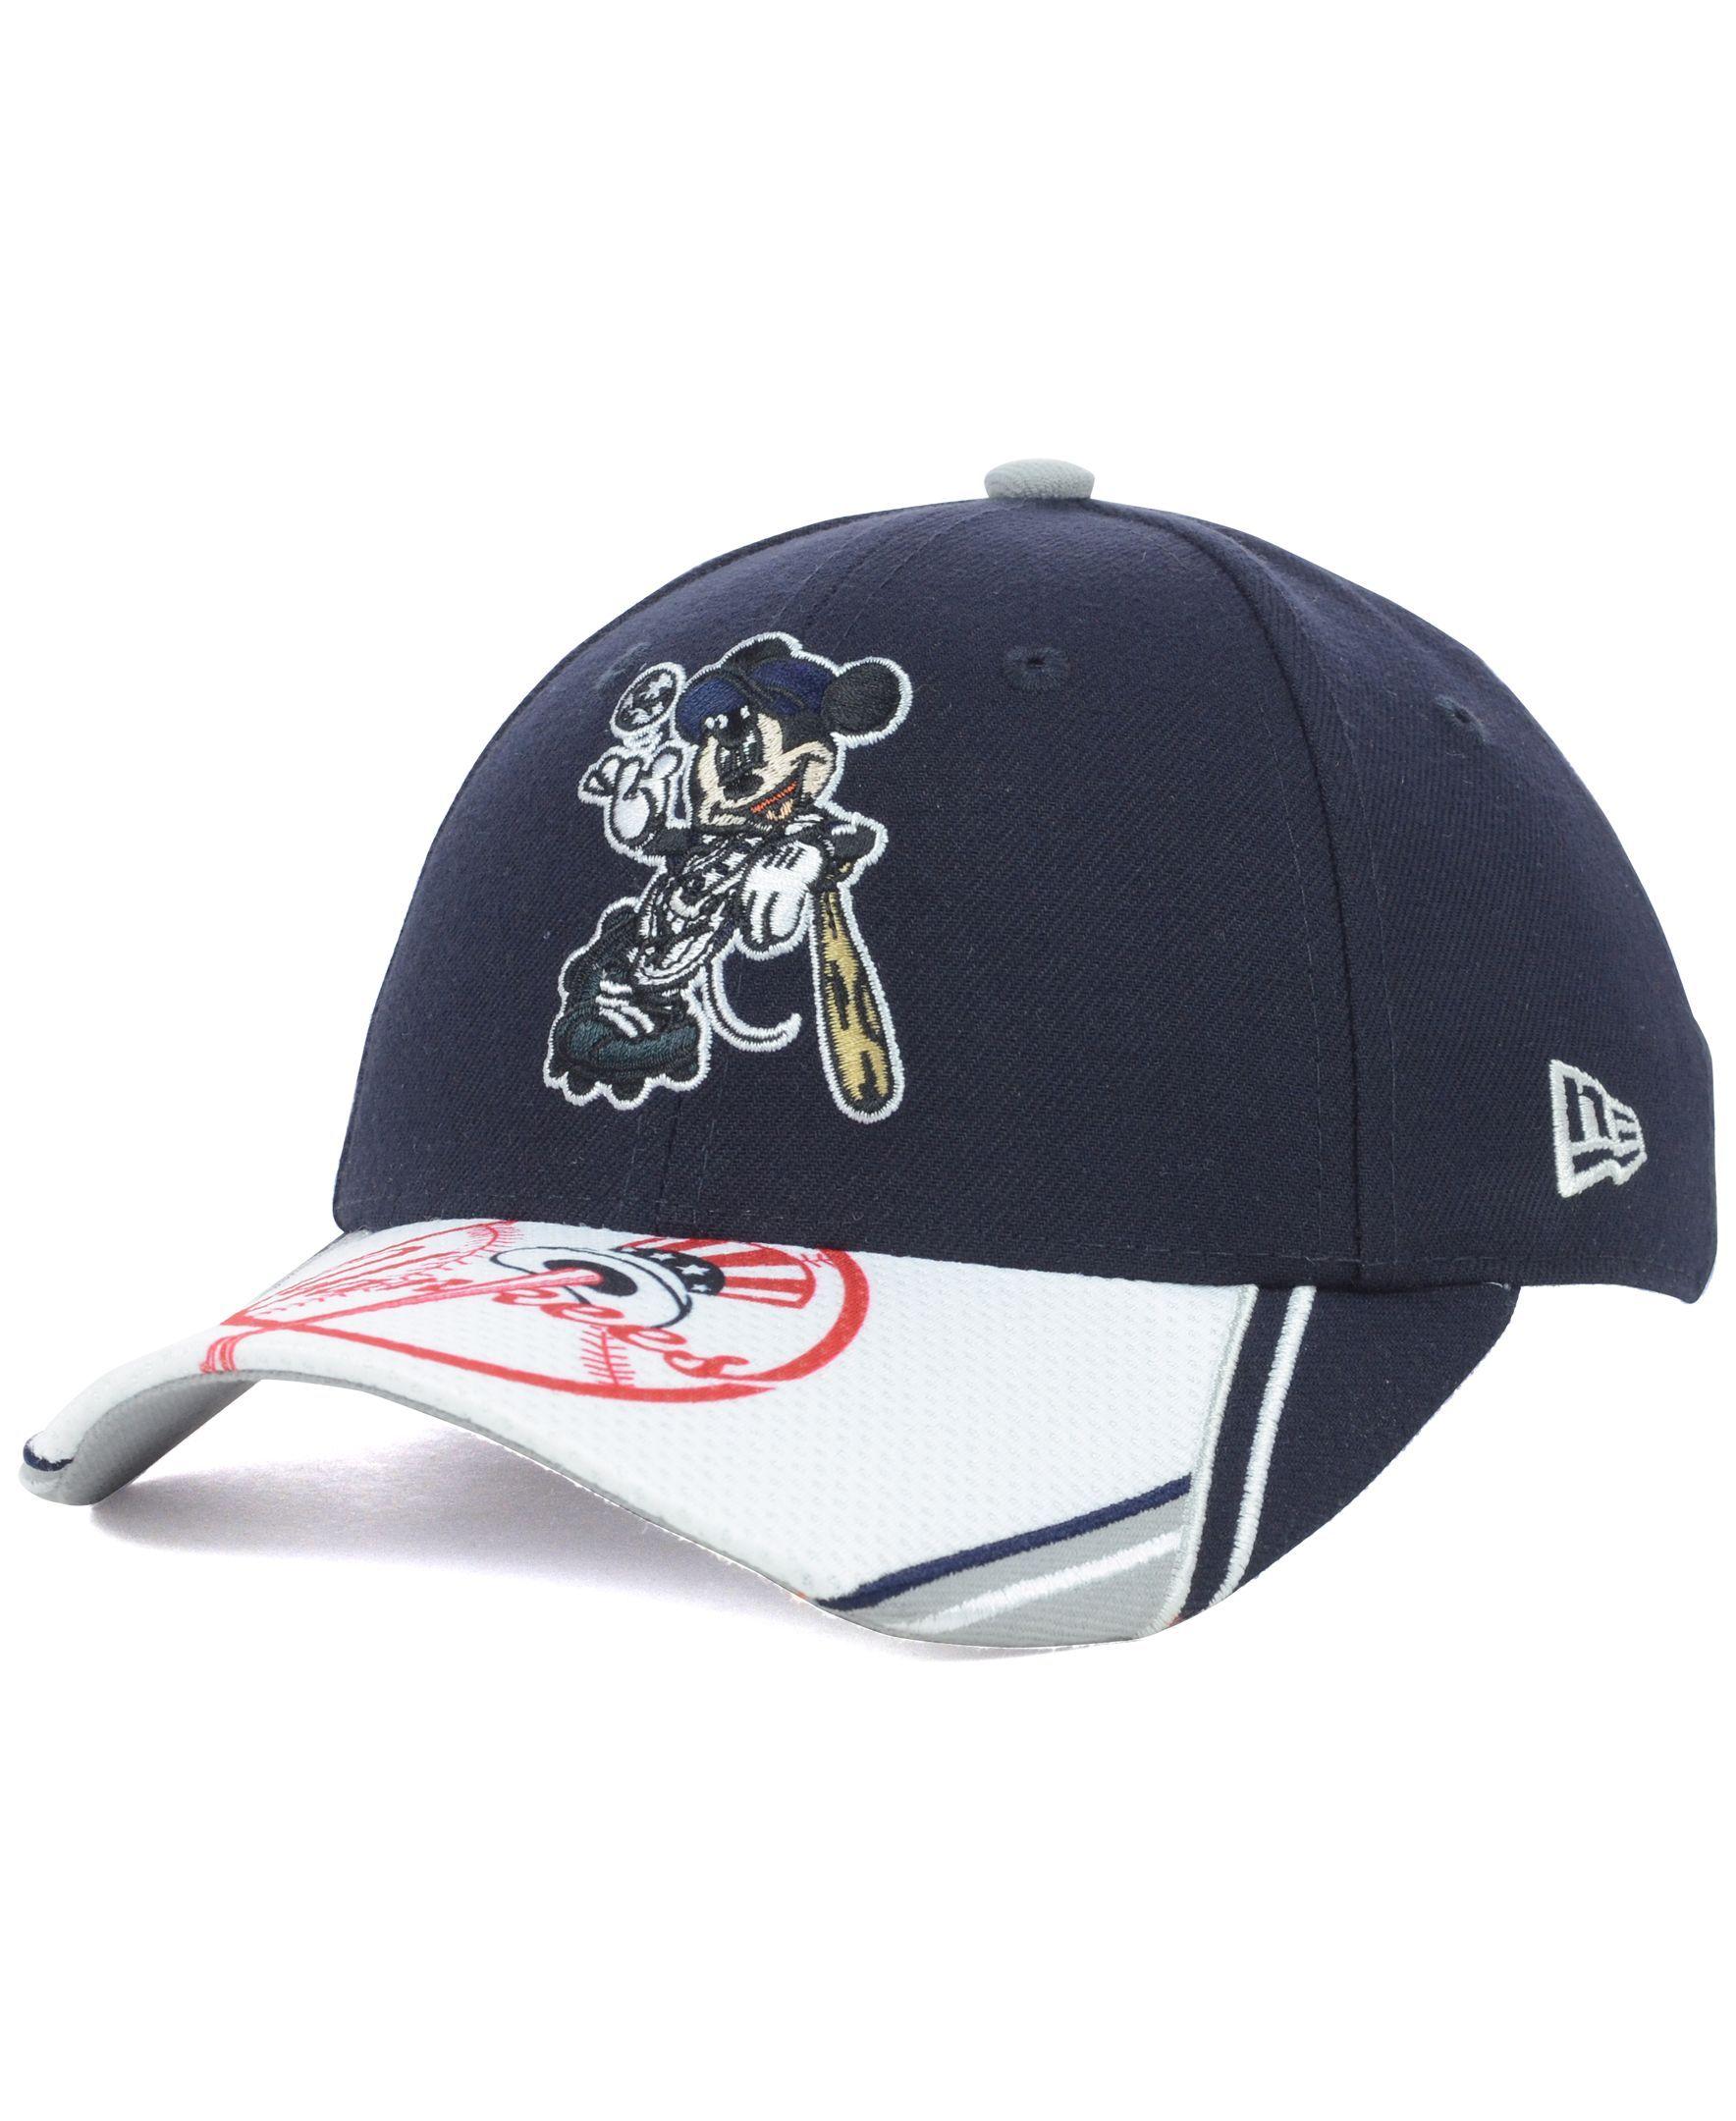 e9b32a3e8c5 ... coupon for new era new york yankees disney dub adjustable kids cap or  toddlers cap sports ...